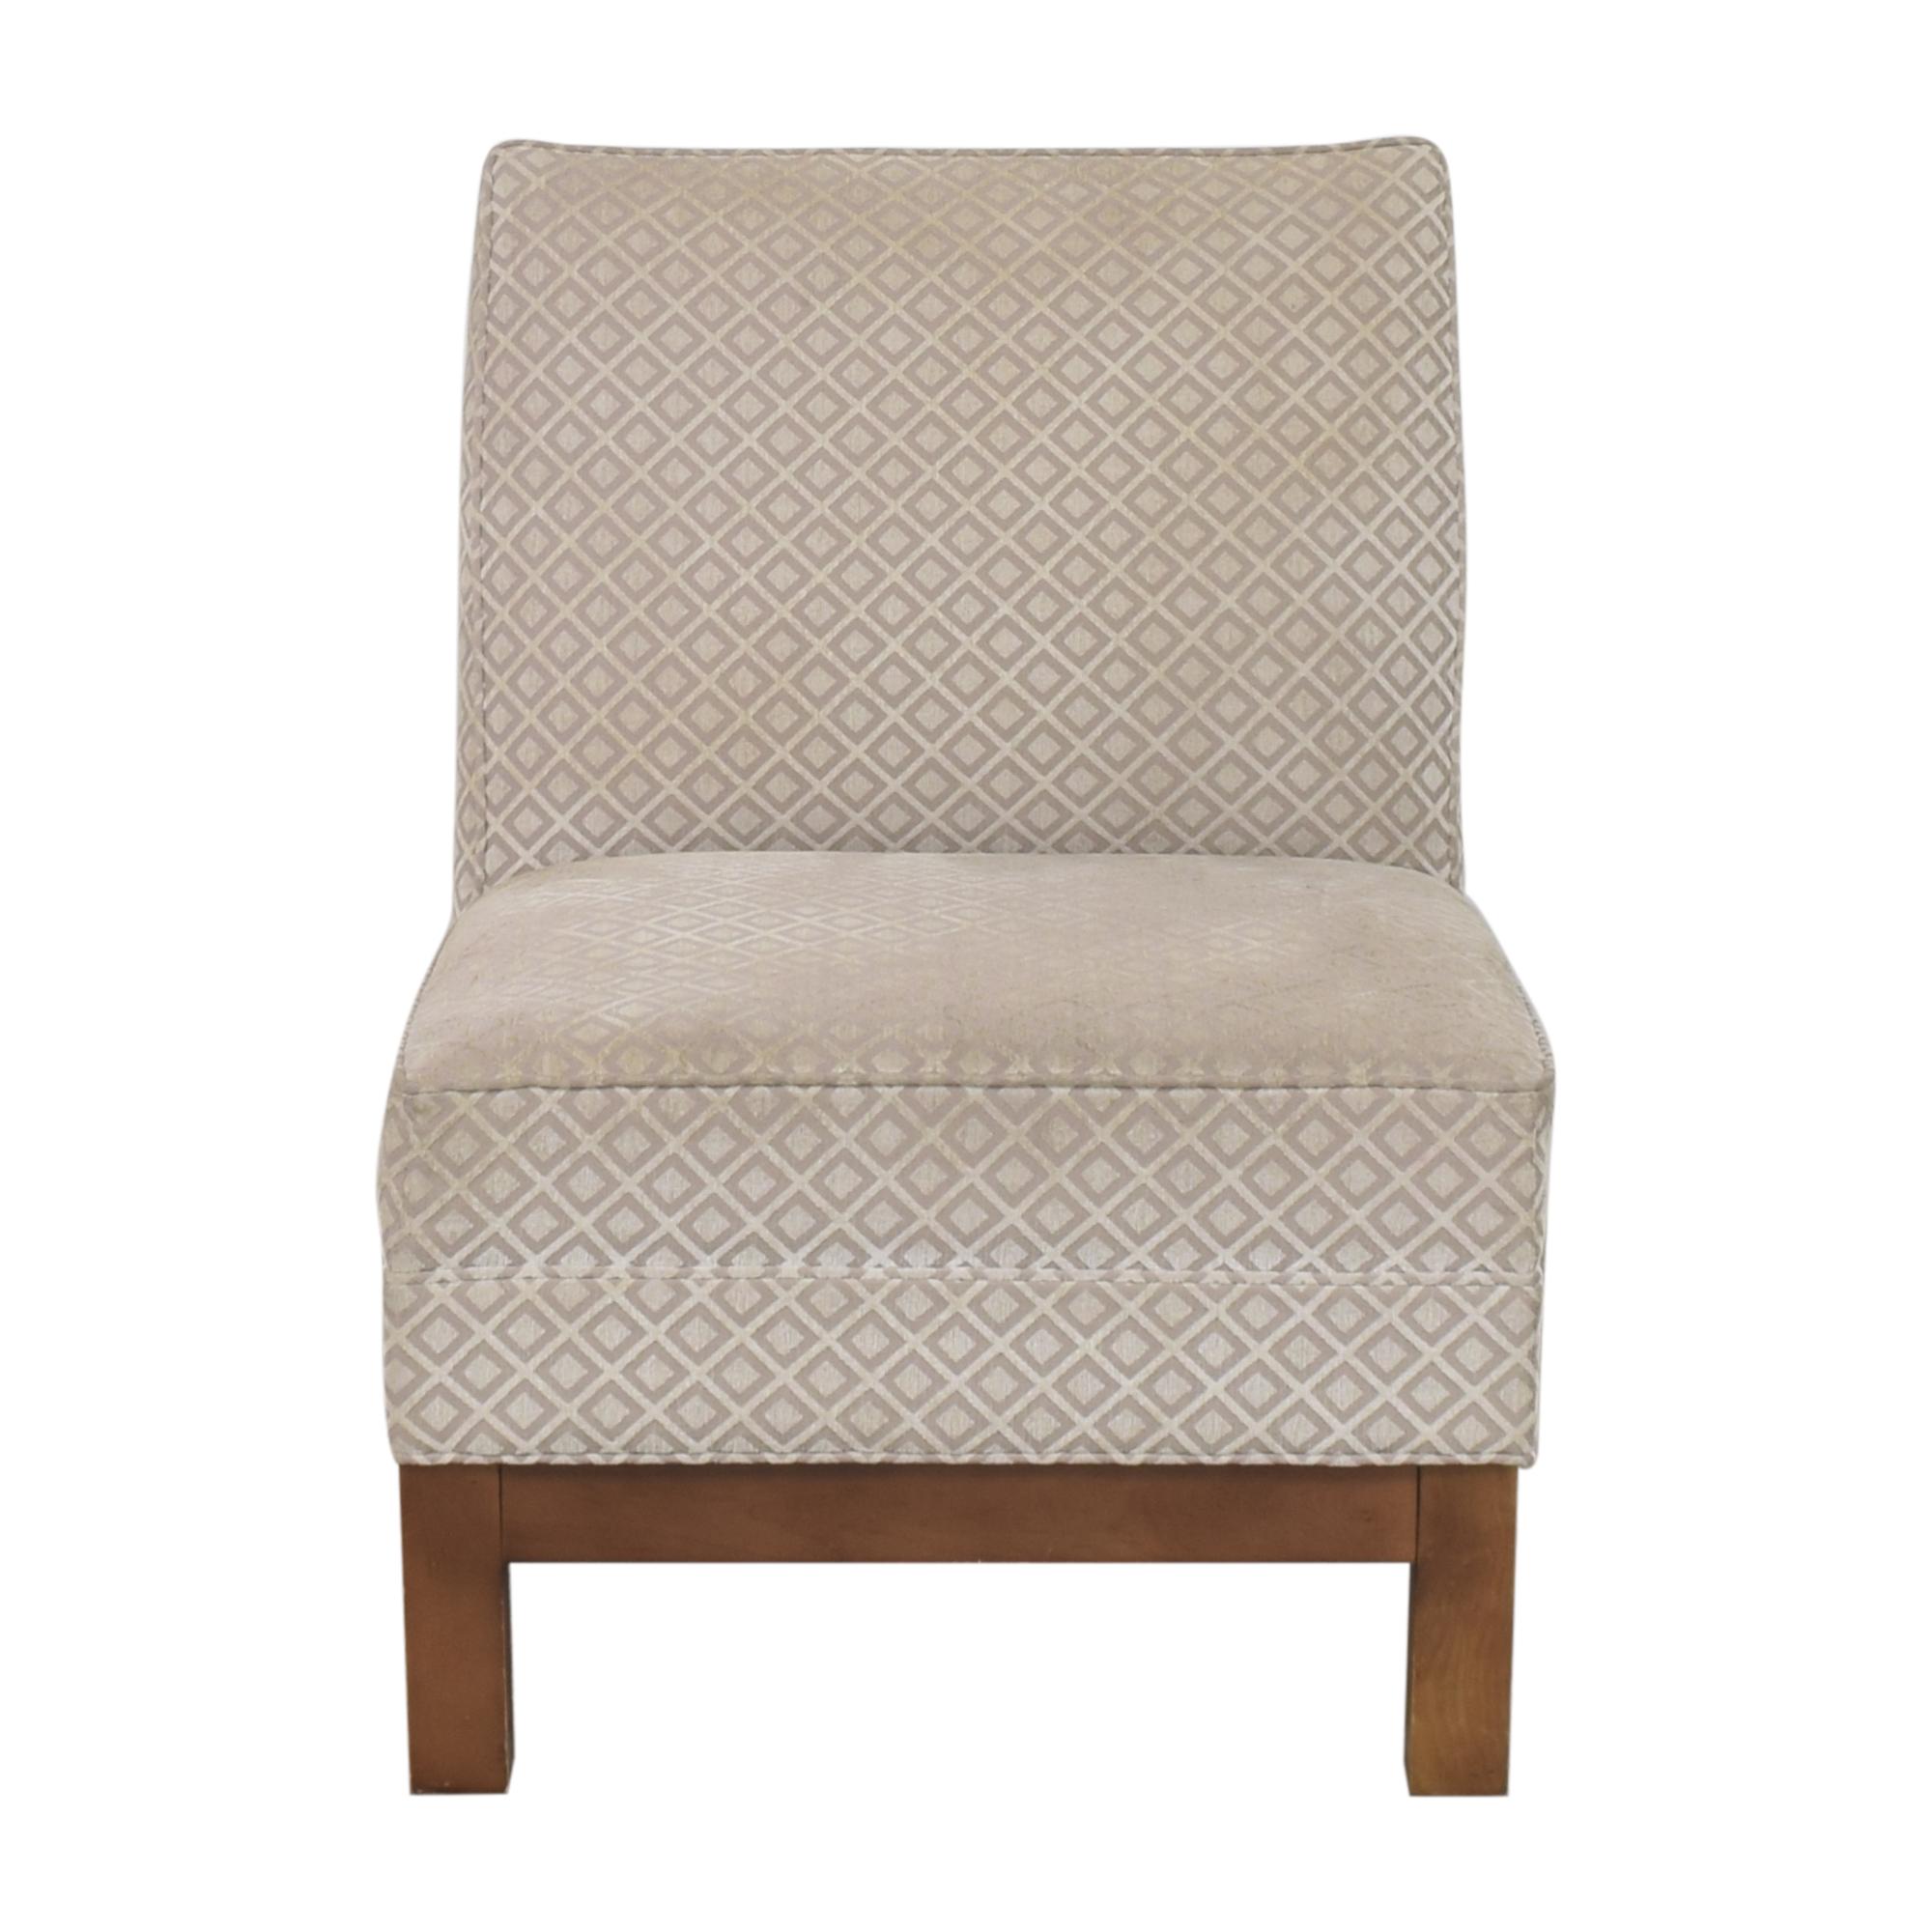 shop Mitchell Gold + Bob Williams Mitchell Gold + Bob Williams Slipper Chair online